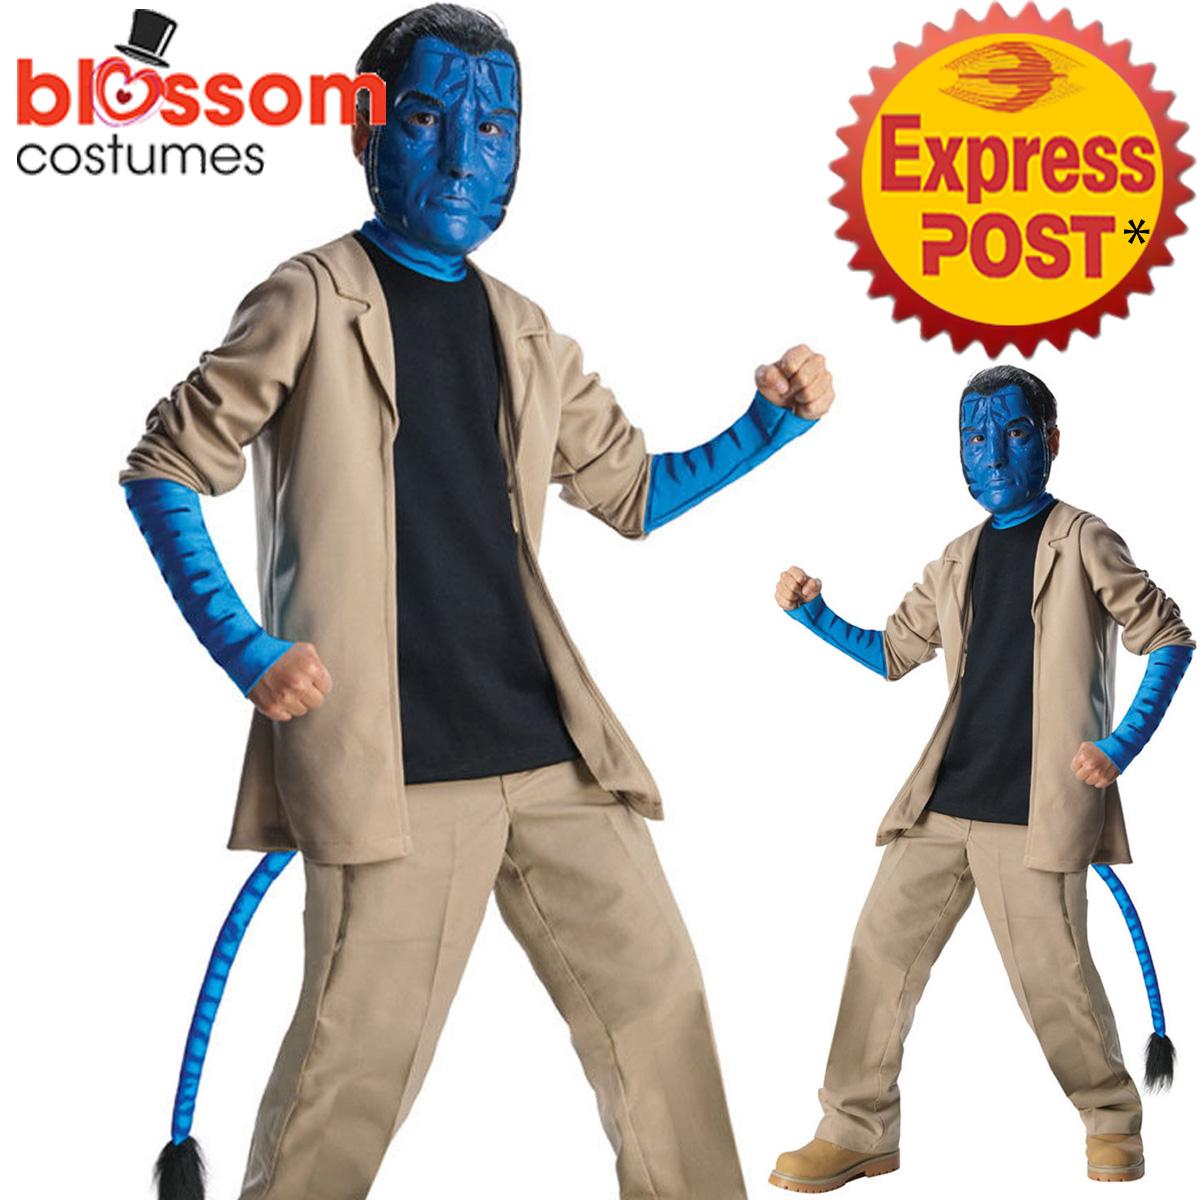 ck1127 dekuxe avatar movie jake sully child boys costume fancy dress